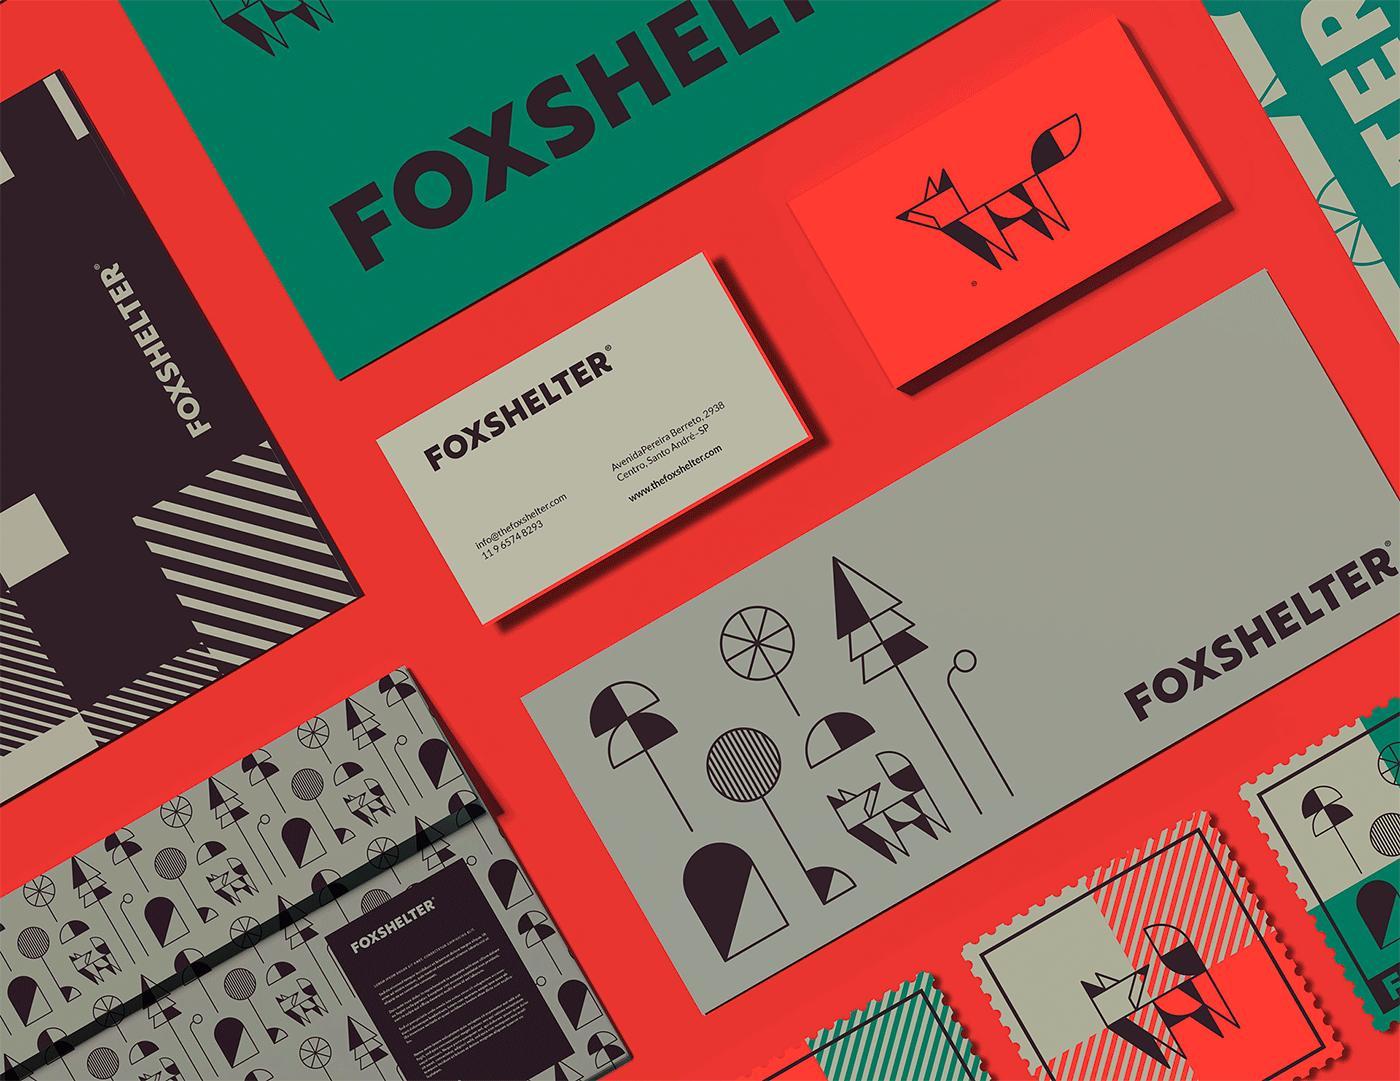 Foxshelter汉堡餐厅品牌VI设计